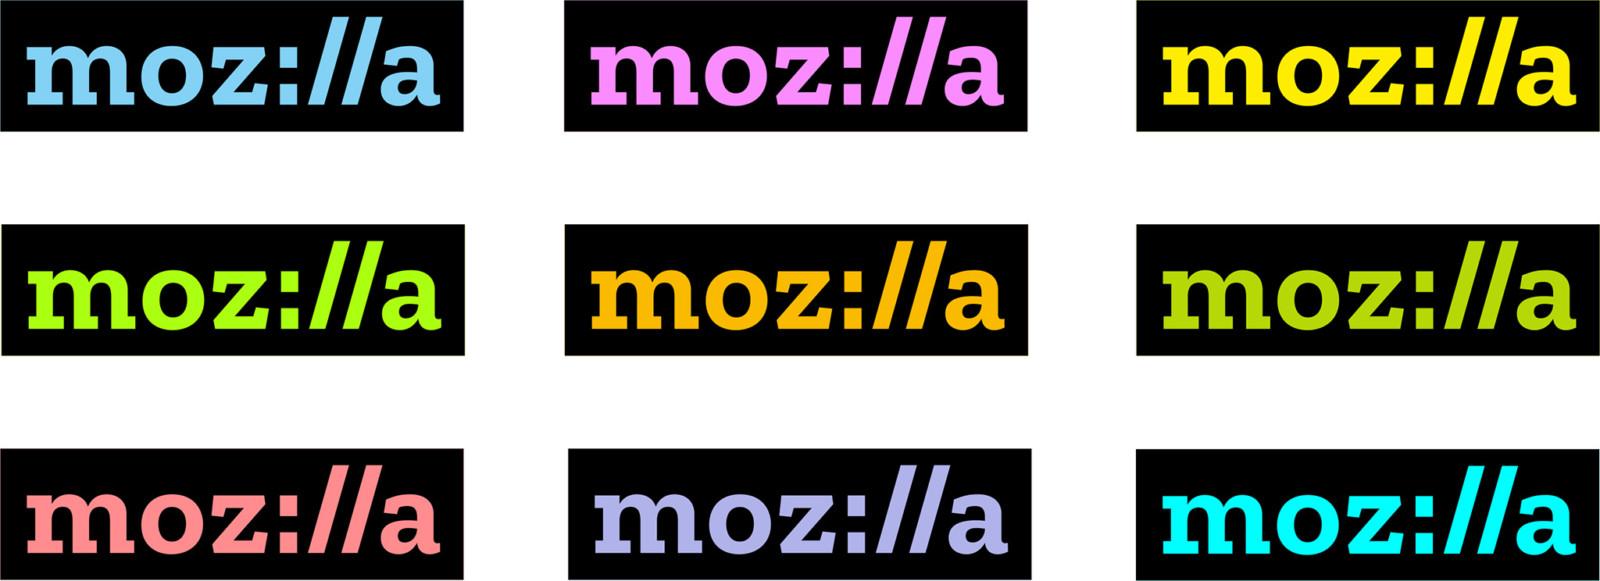 Mozilla Foundation photo